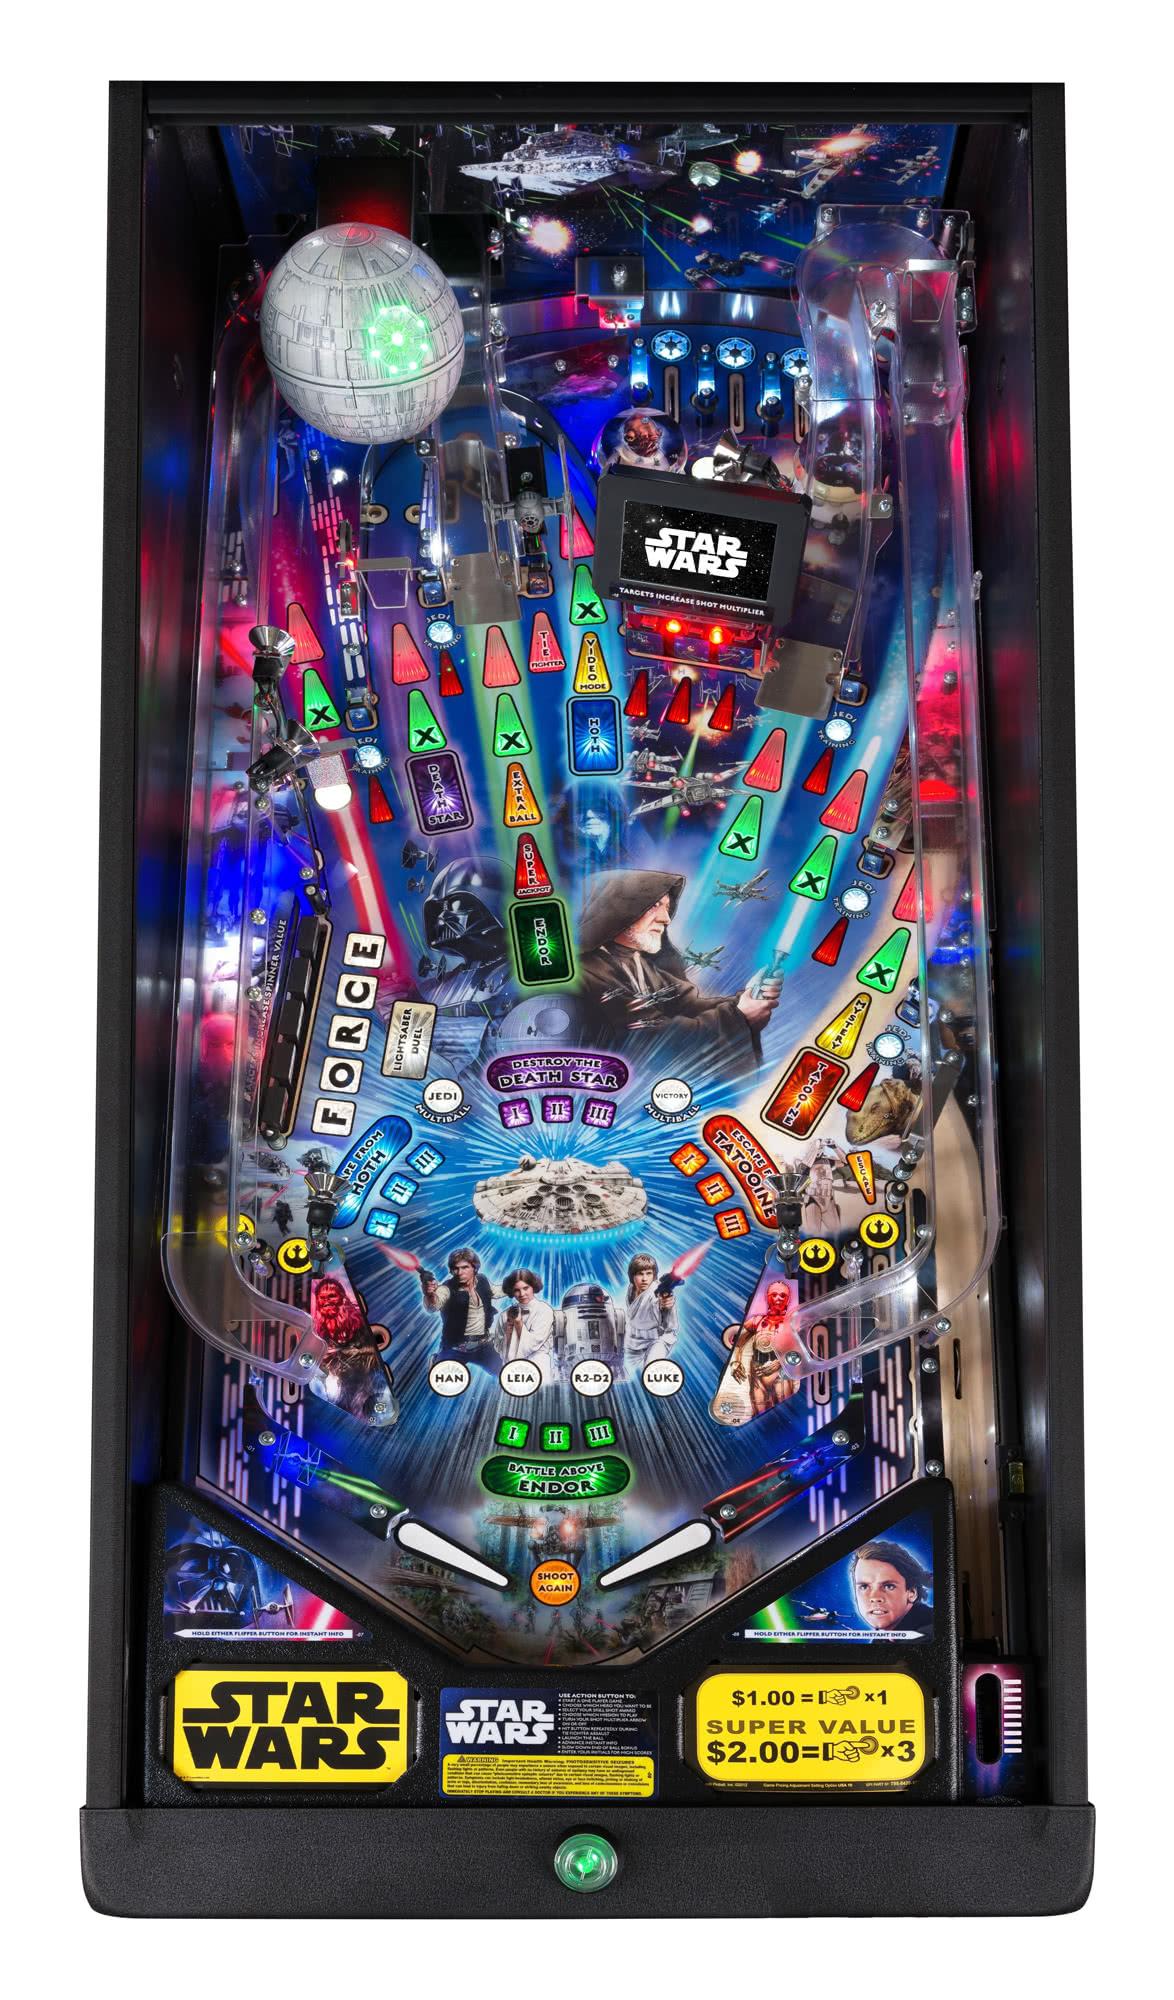 Stern Star Wars Pro Pinball Machine Liberty Games